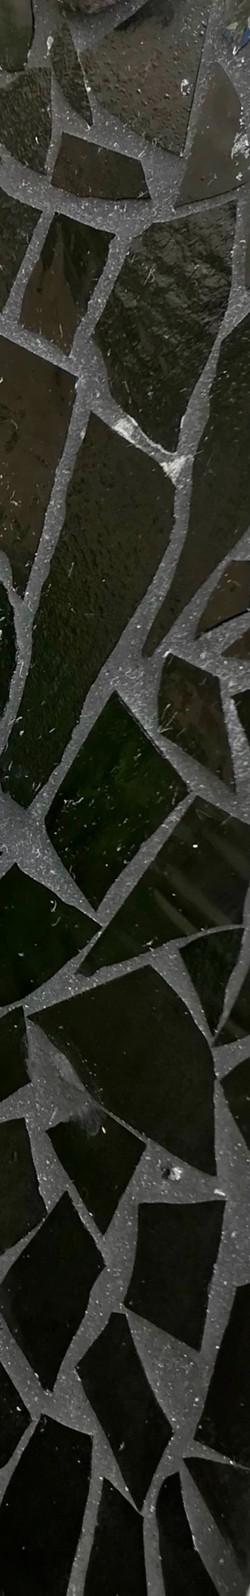 mosaic%20close%20up%207_edited